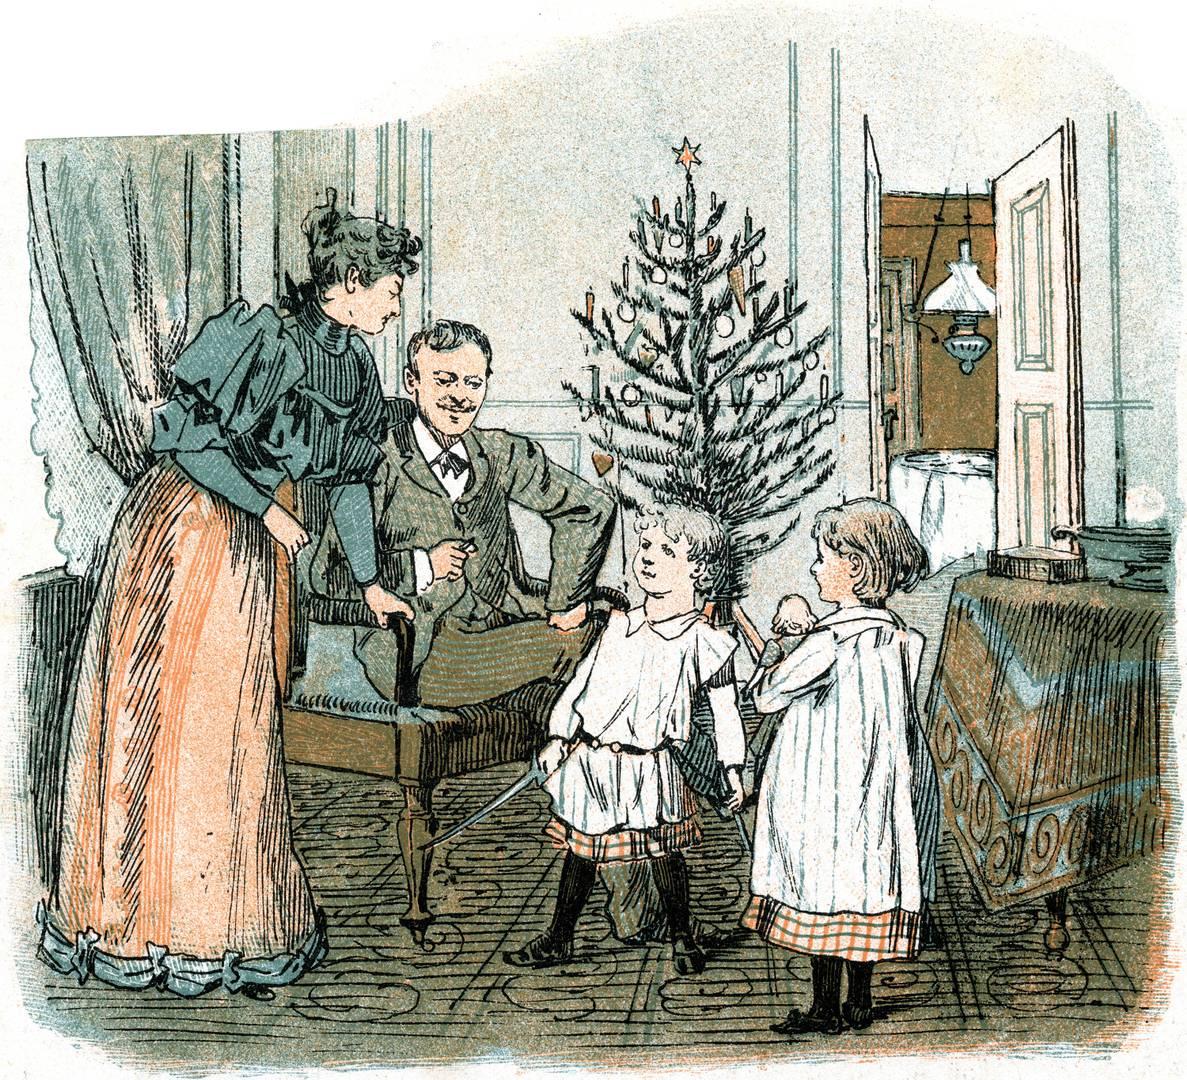 Журнал Punch (Дания) № 52. «Мама, папа дал мне настоящую саблю! Теперь ты купишь мне врага?». 29 декабря 1892 года